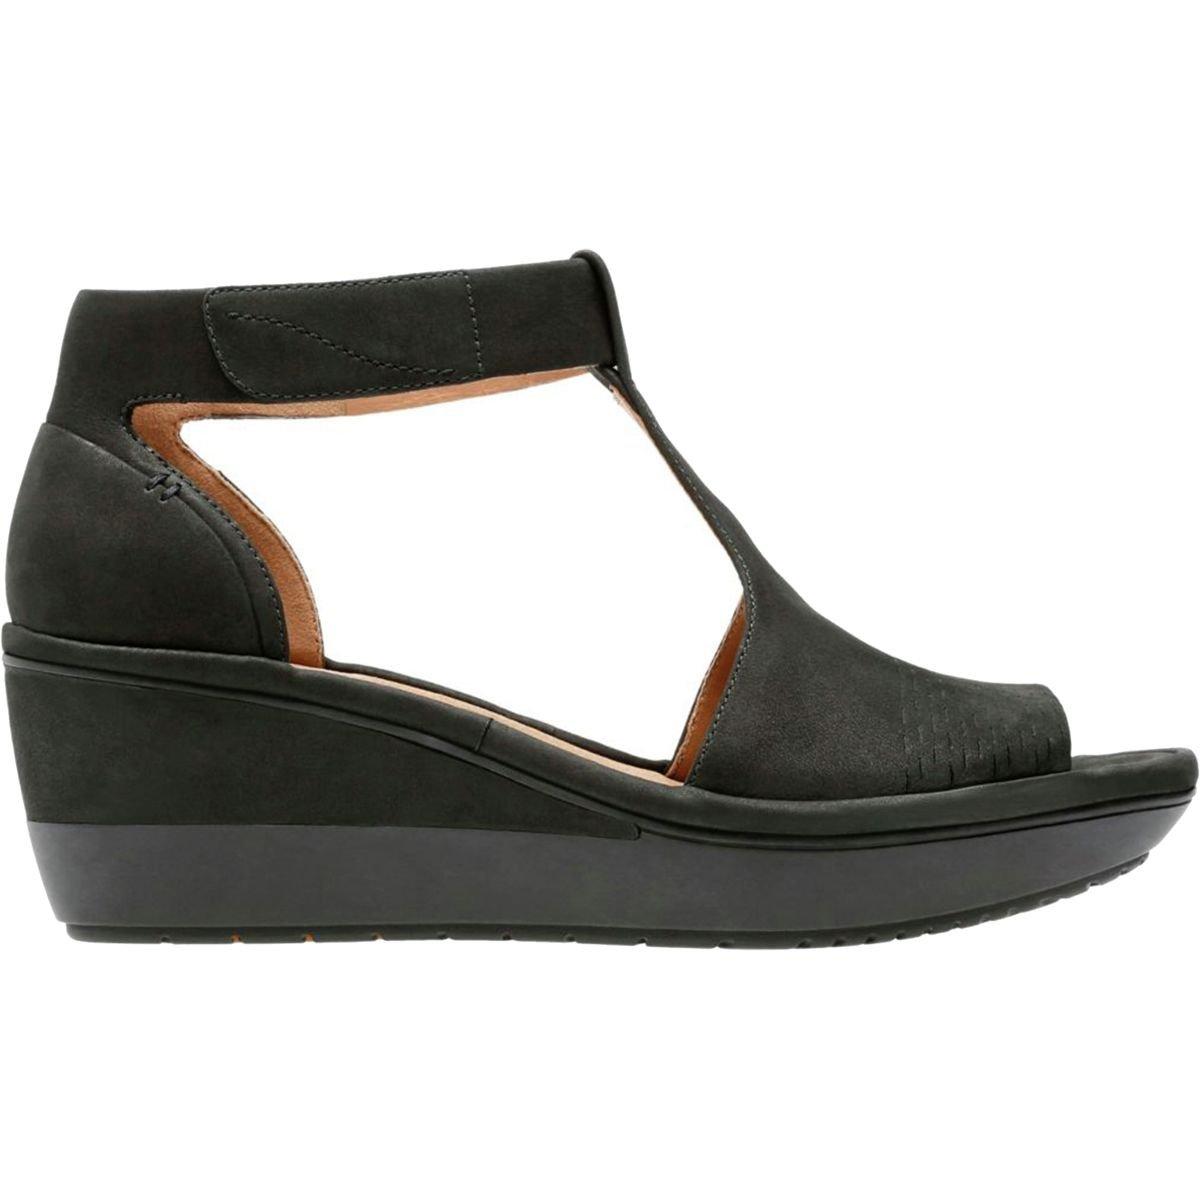 CLARKS Wynnmere Abie Women's Sandal 10 B(M) US Black-Nubuck